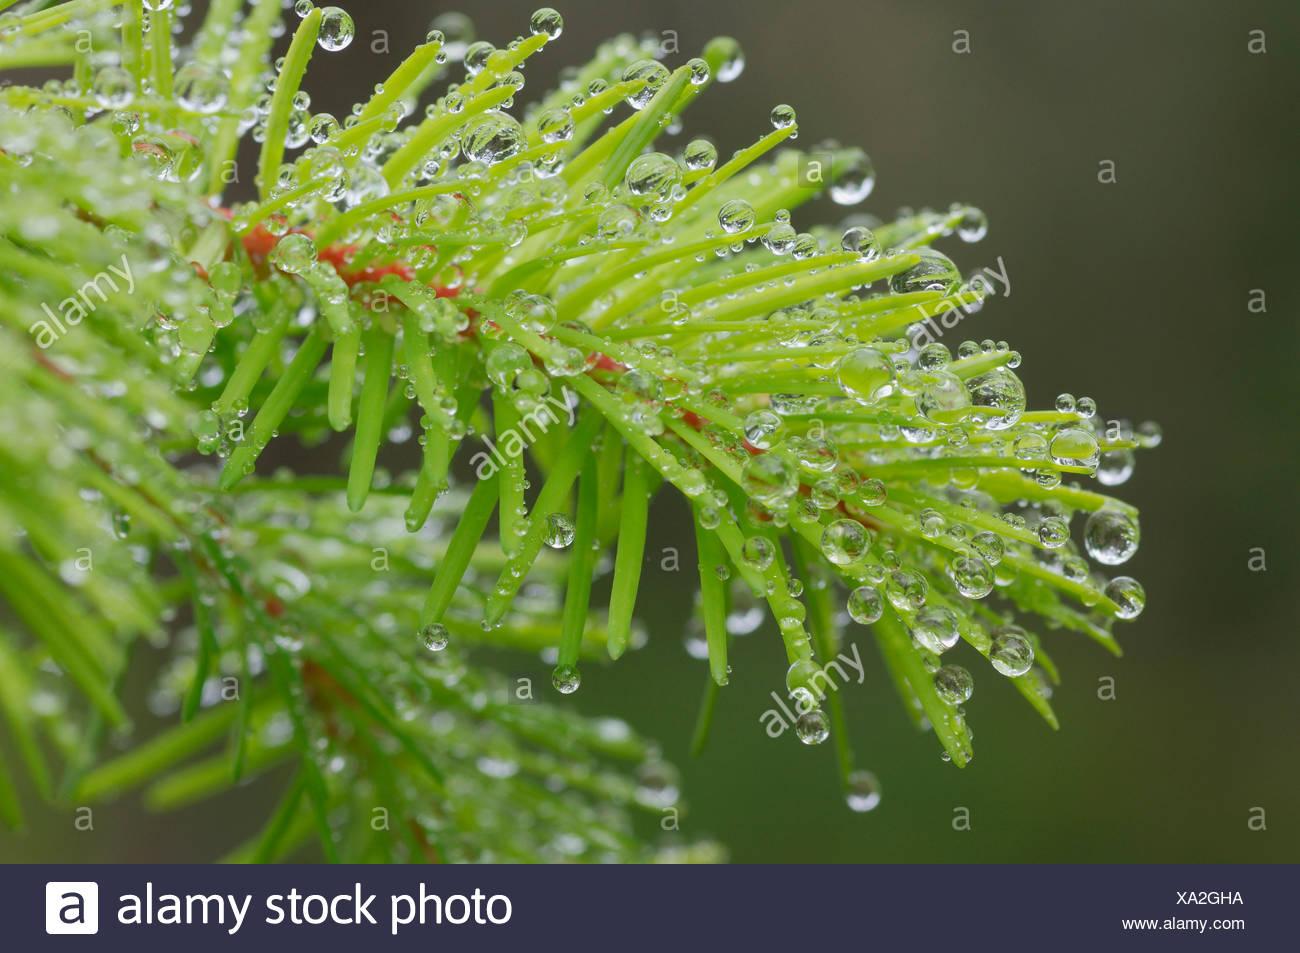 USA, Oregon, Dew drops on twig, close-up - Stock Image